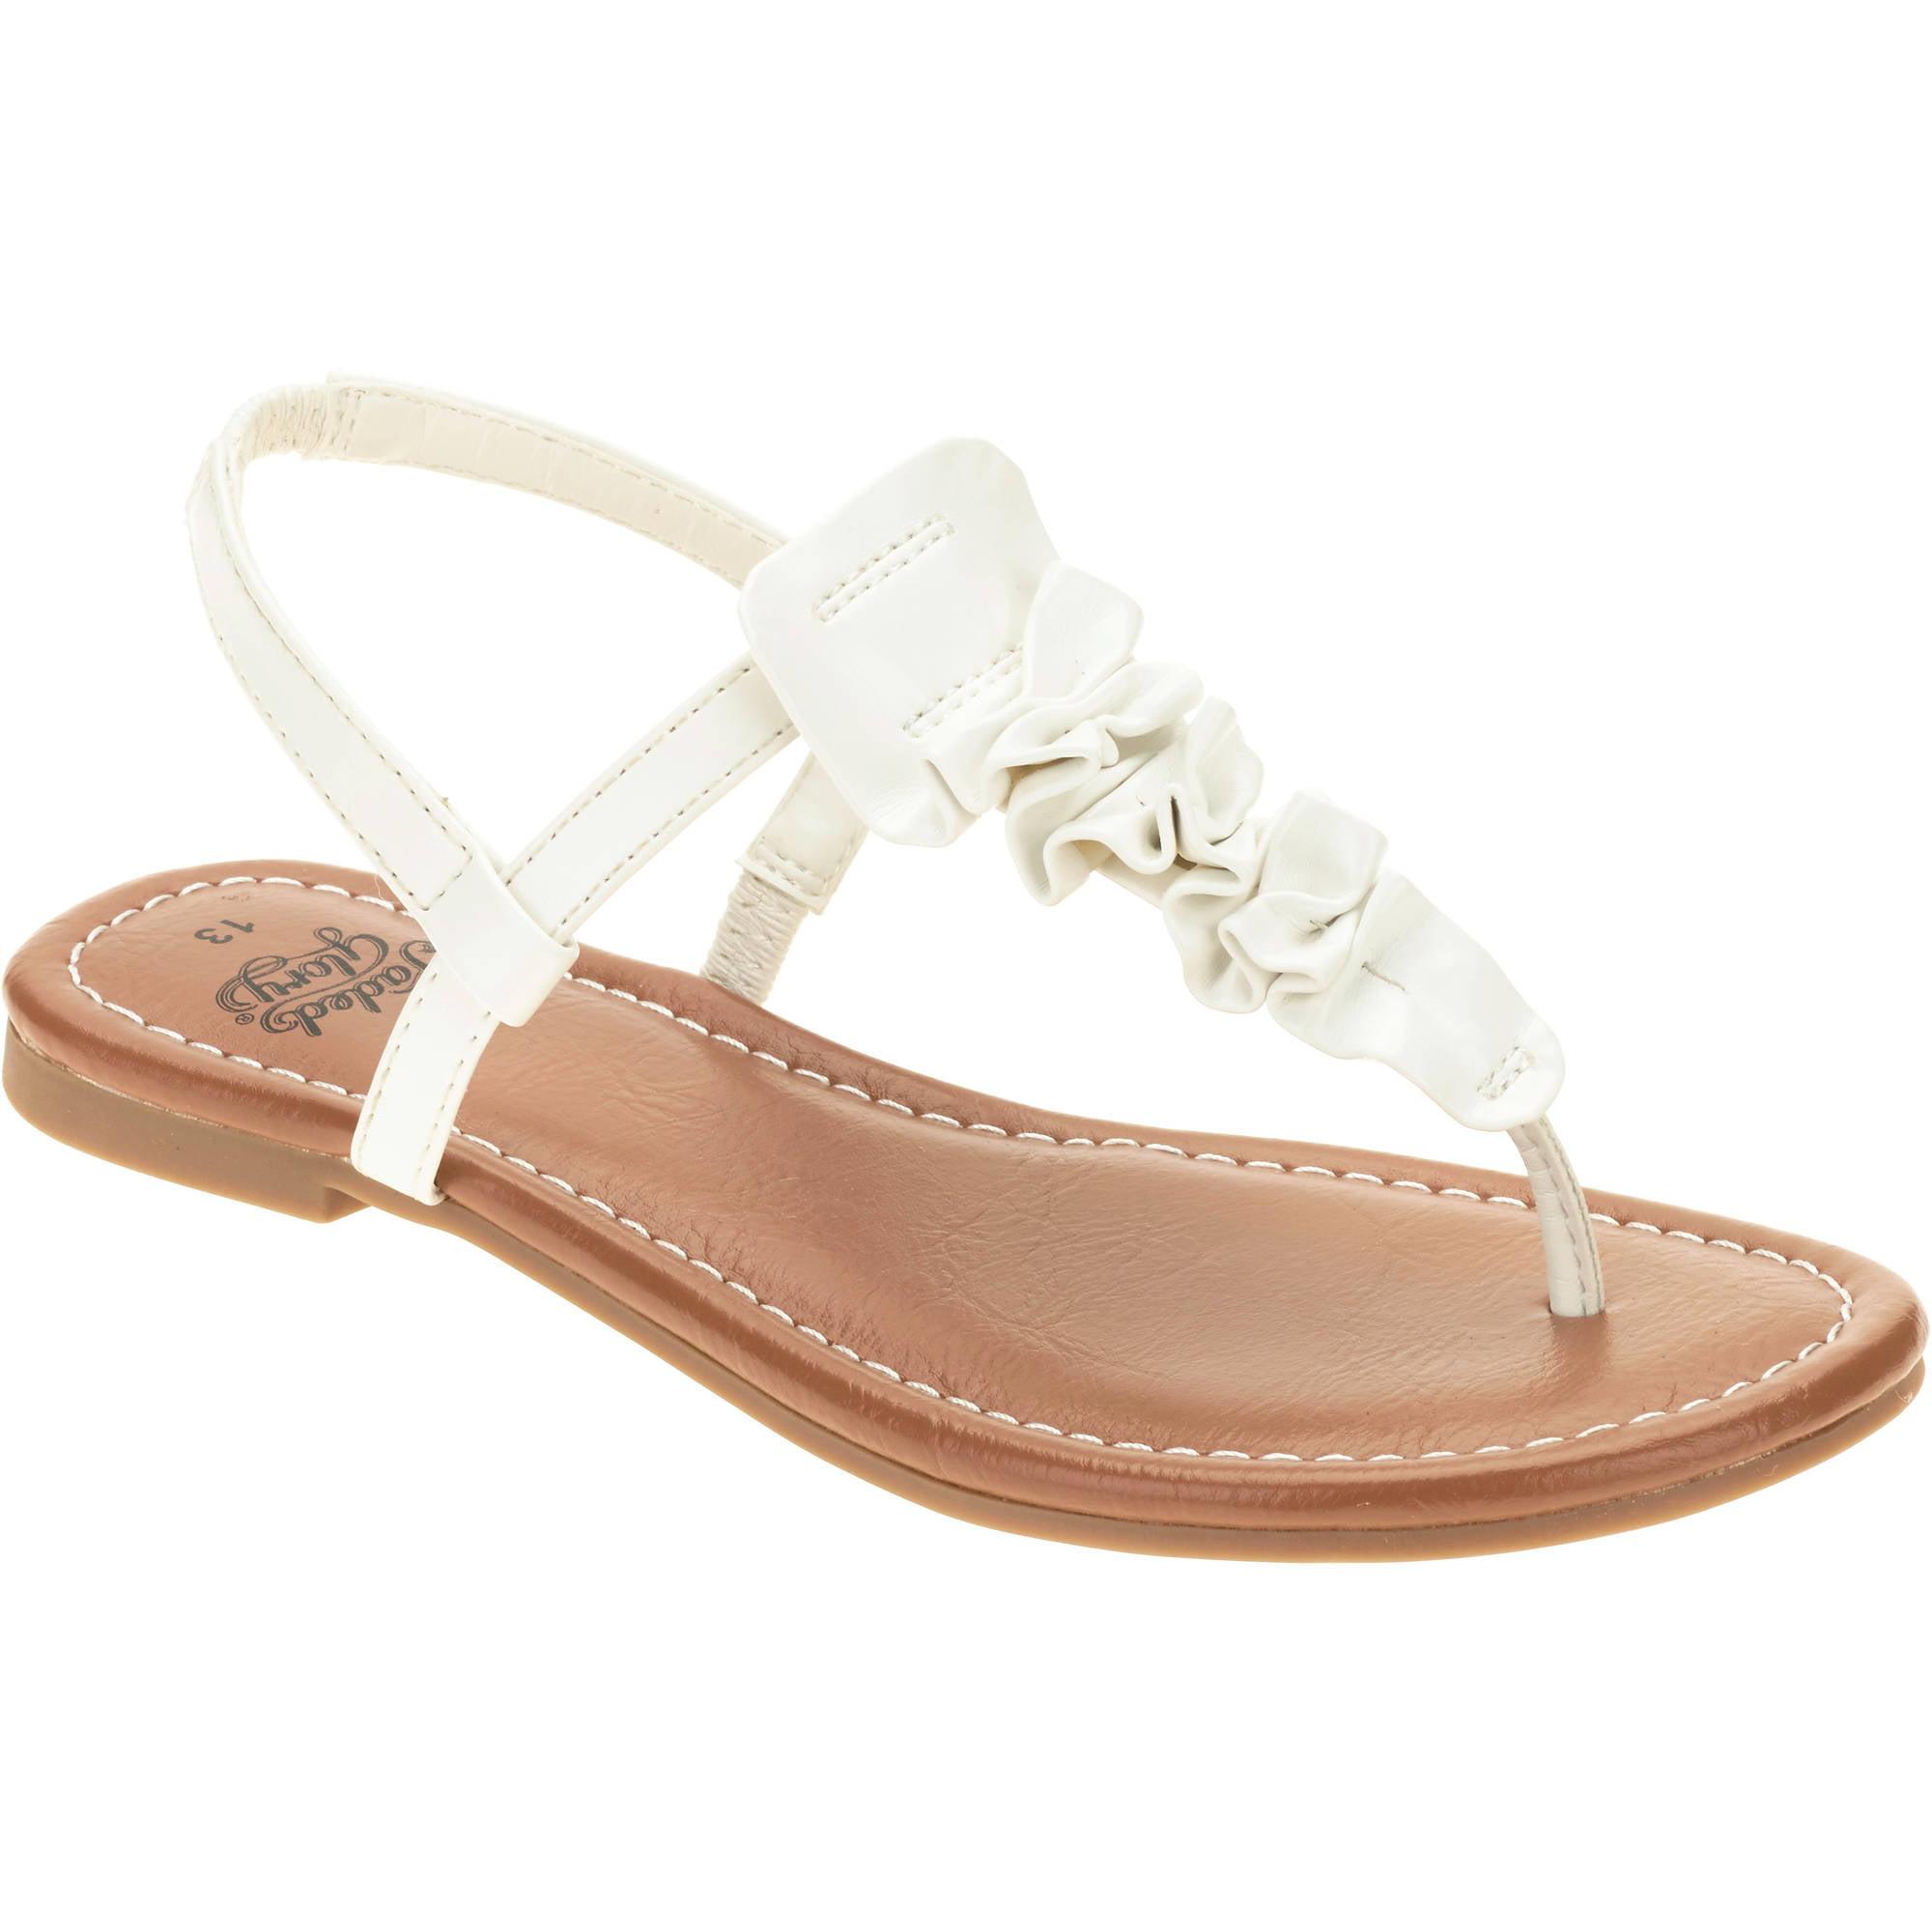 Girls sandals - Girls Sandals 7